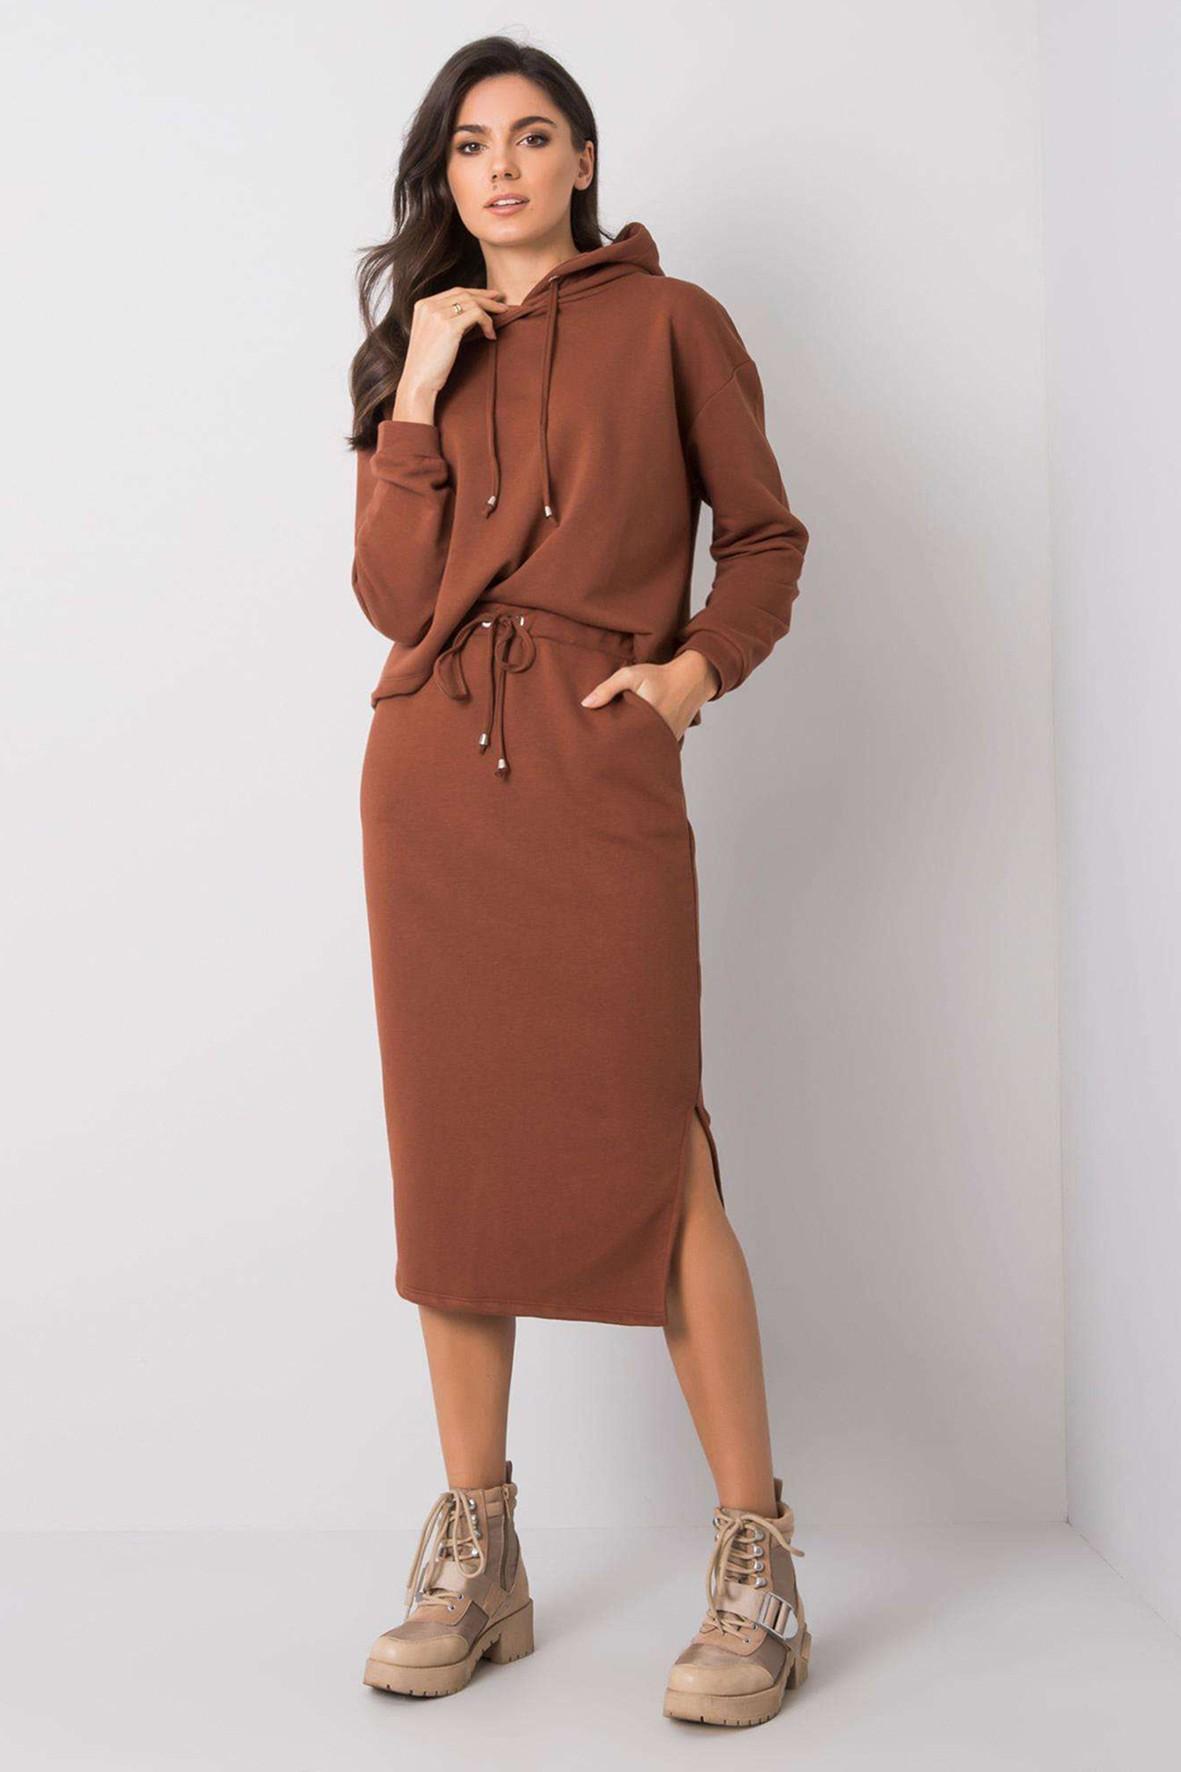 RUE PARIS Komplet damski - spódnica za kolano i bluza z kapturem - brązowa